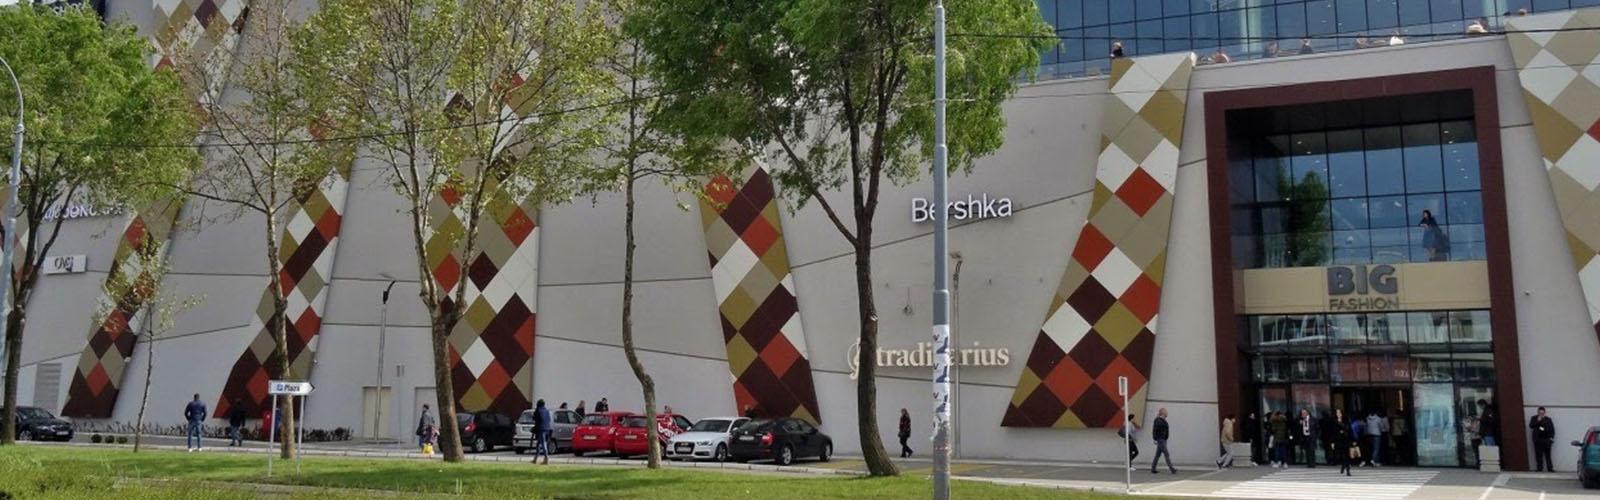 Concierge Belgrade | Big Fashion shopping mall